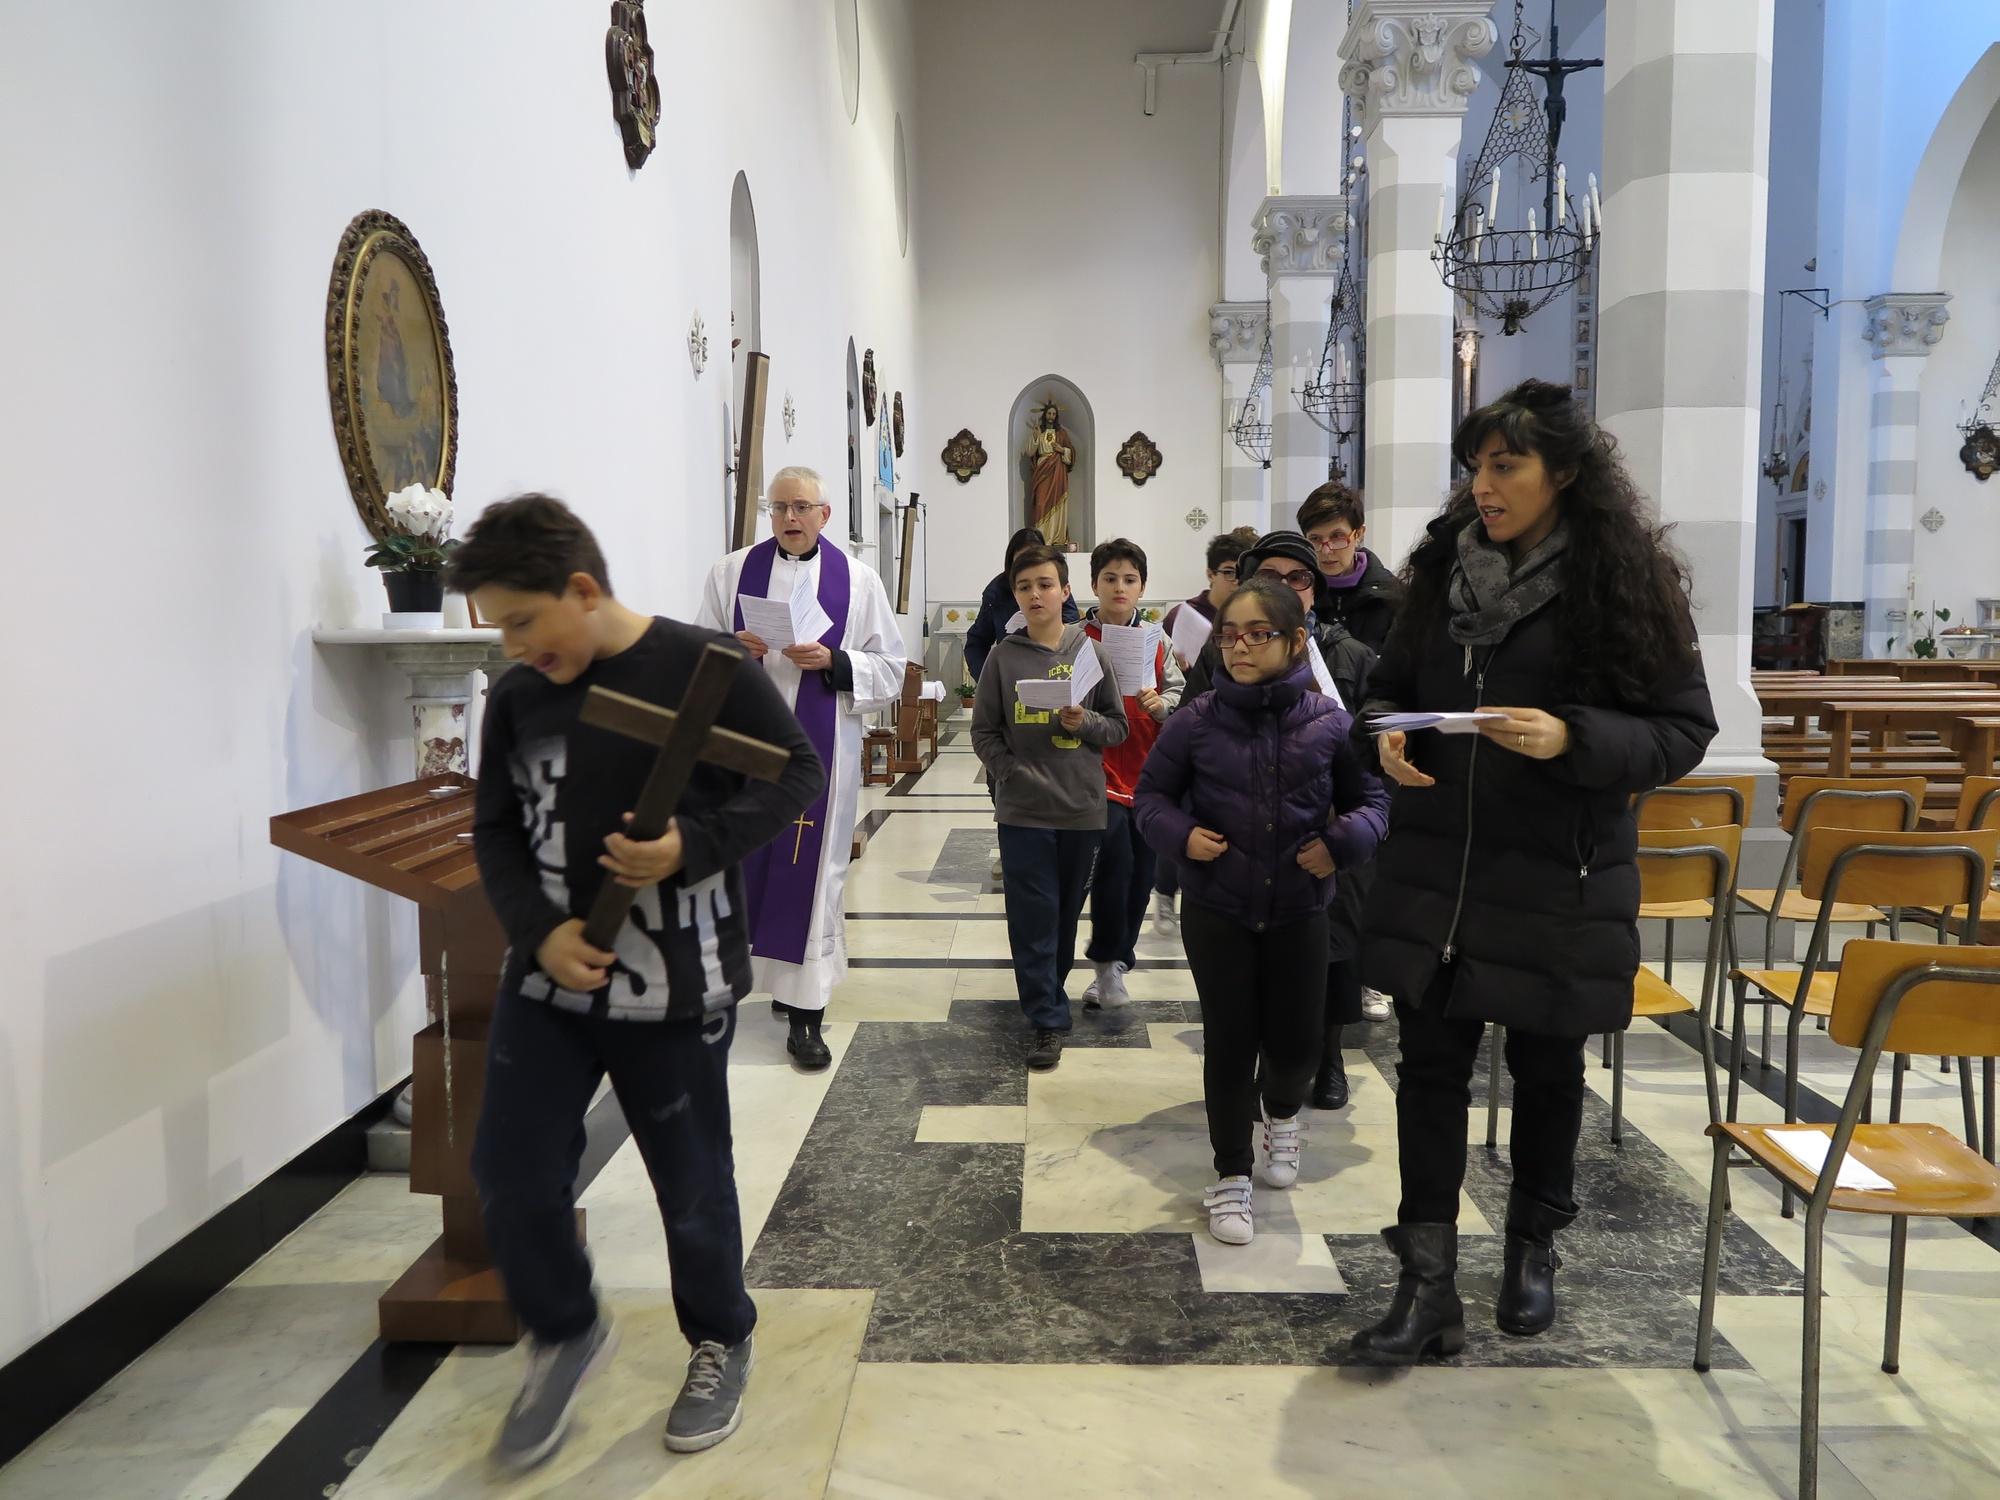 via-crucis-catechismo-2016-03-18-15-21-47